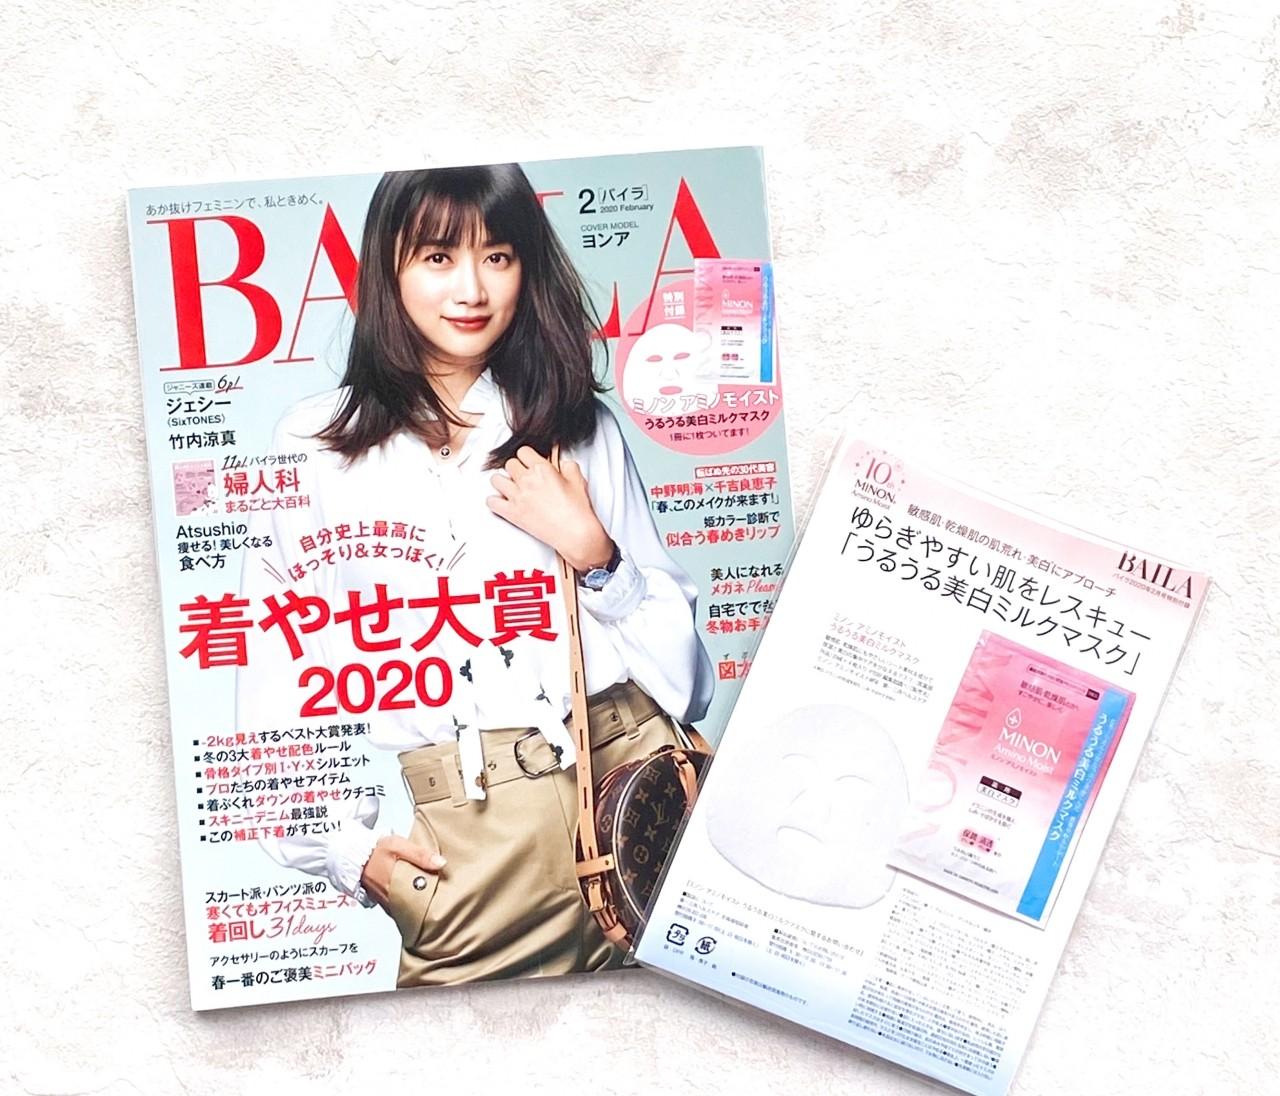 BAILA2月号発売♪今月の読みどころは?